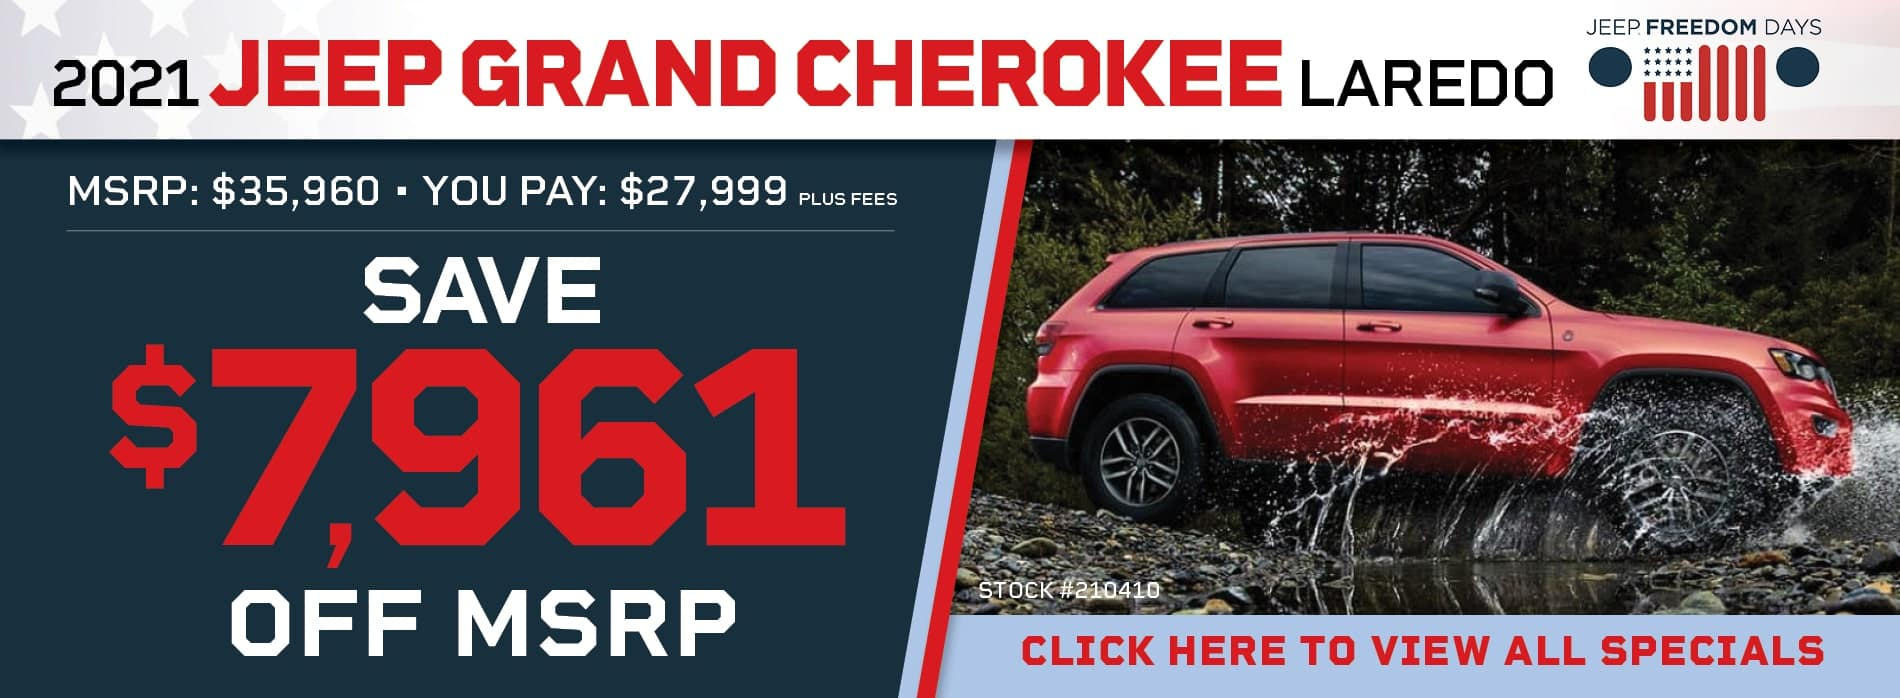 060421 Jeep Banners3-min